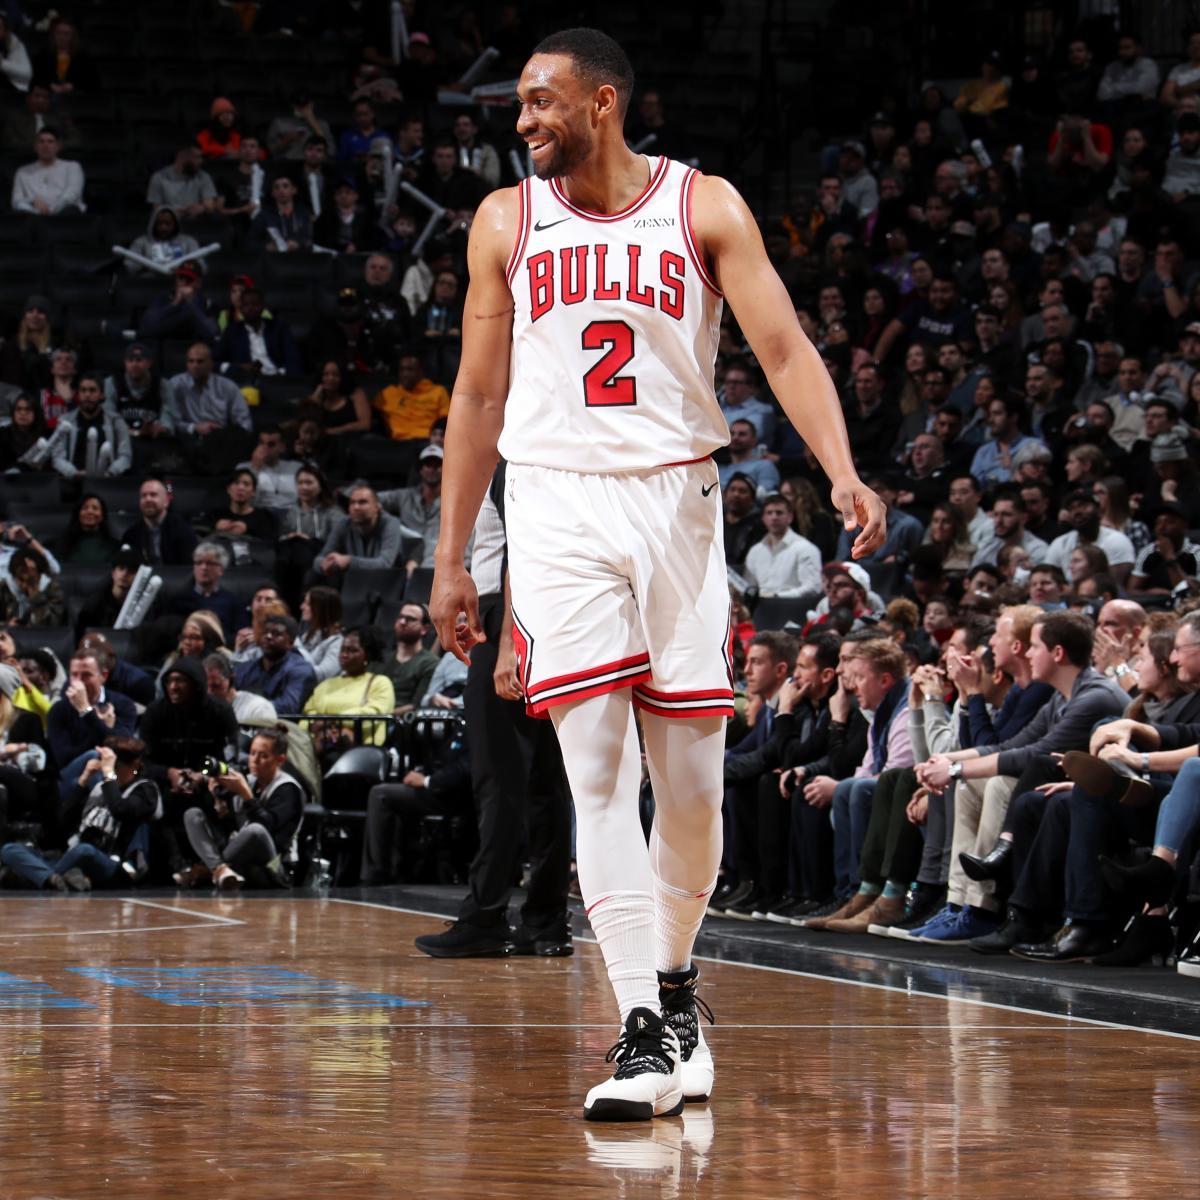 83d8c8869bd NBA Rumors  Lakers Talking Jabari Parker for Caldwell-Pope Trade with Bulls